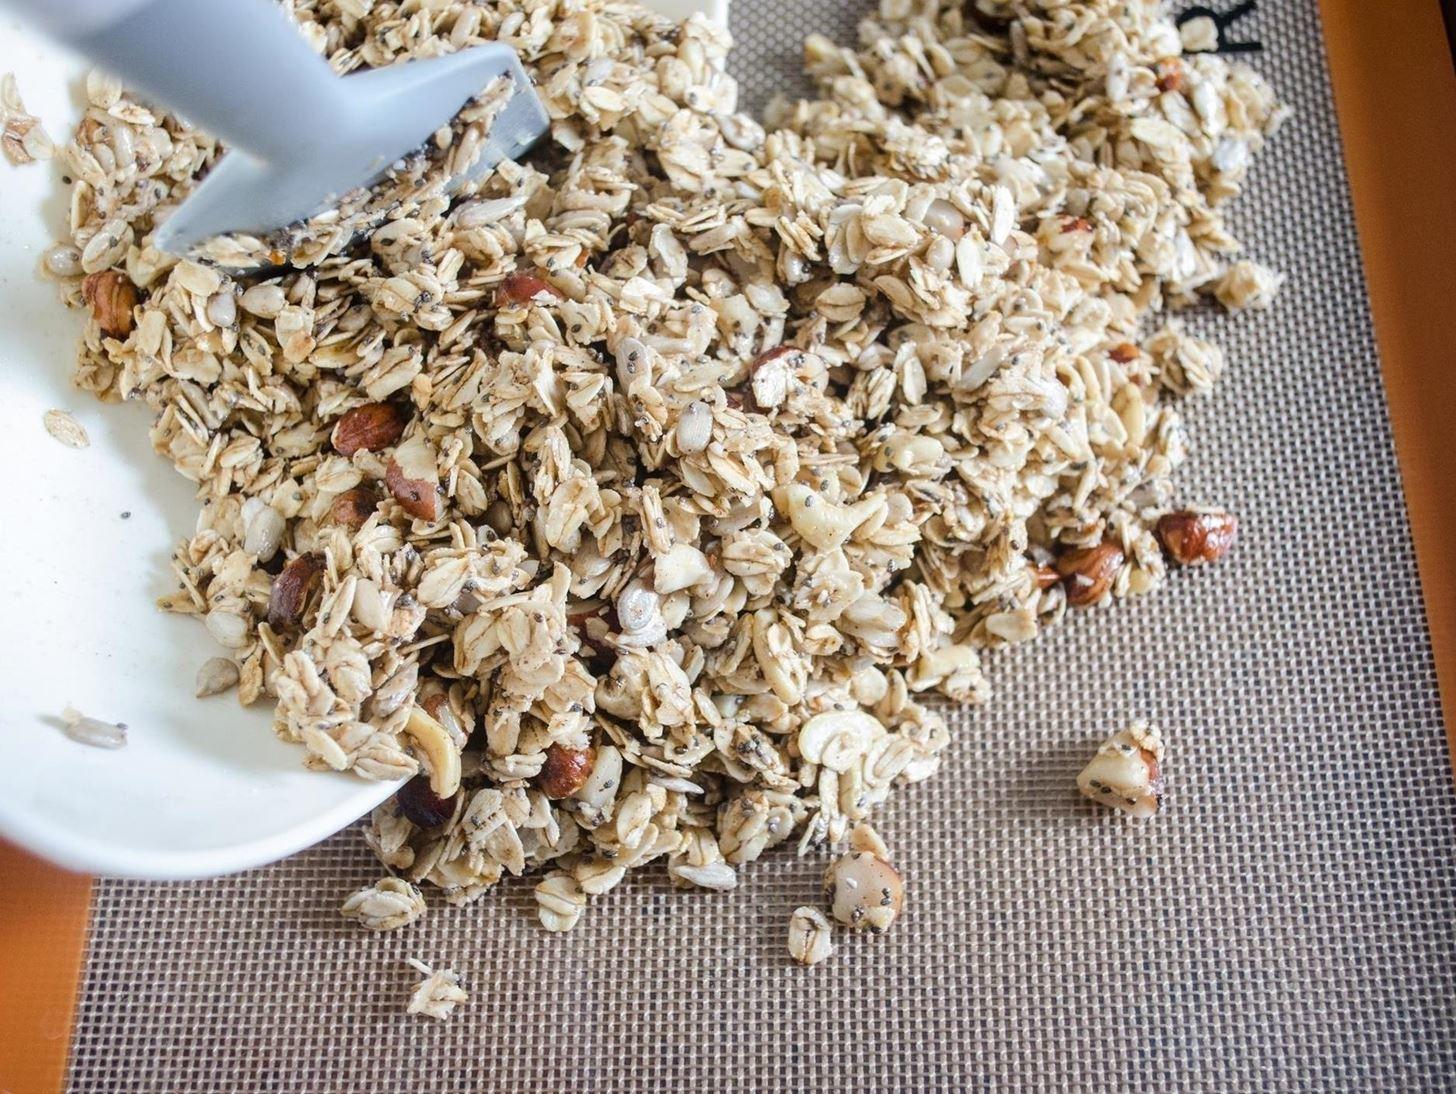 You Don't Need a Recipe to Make Delicious Granola